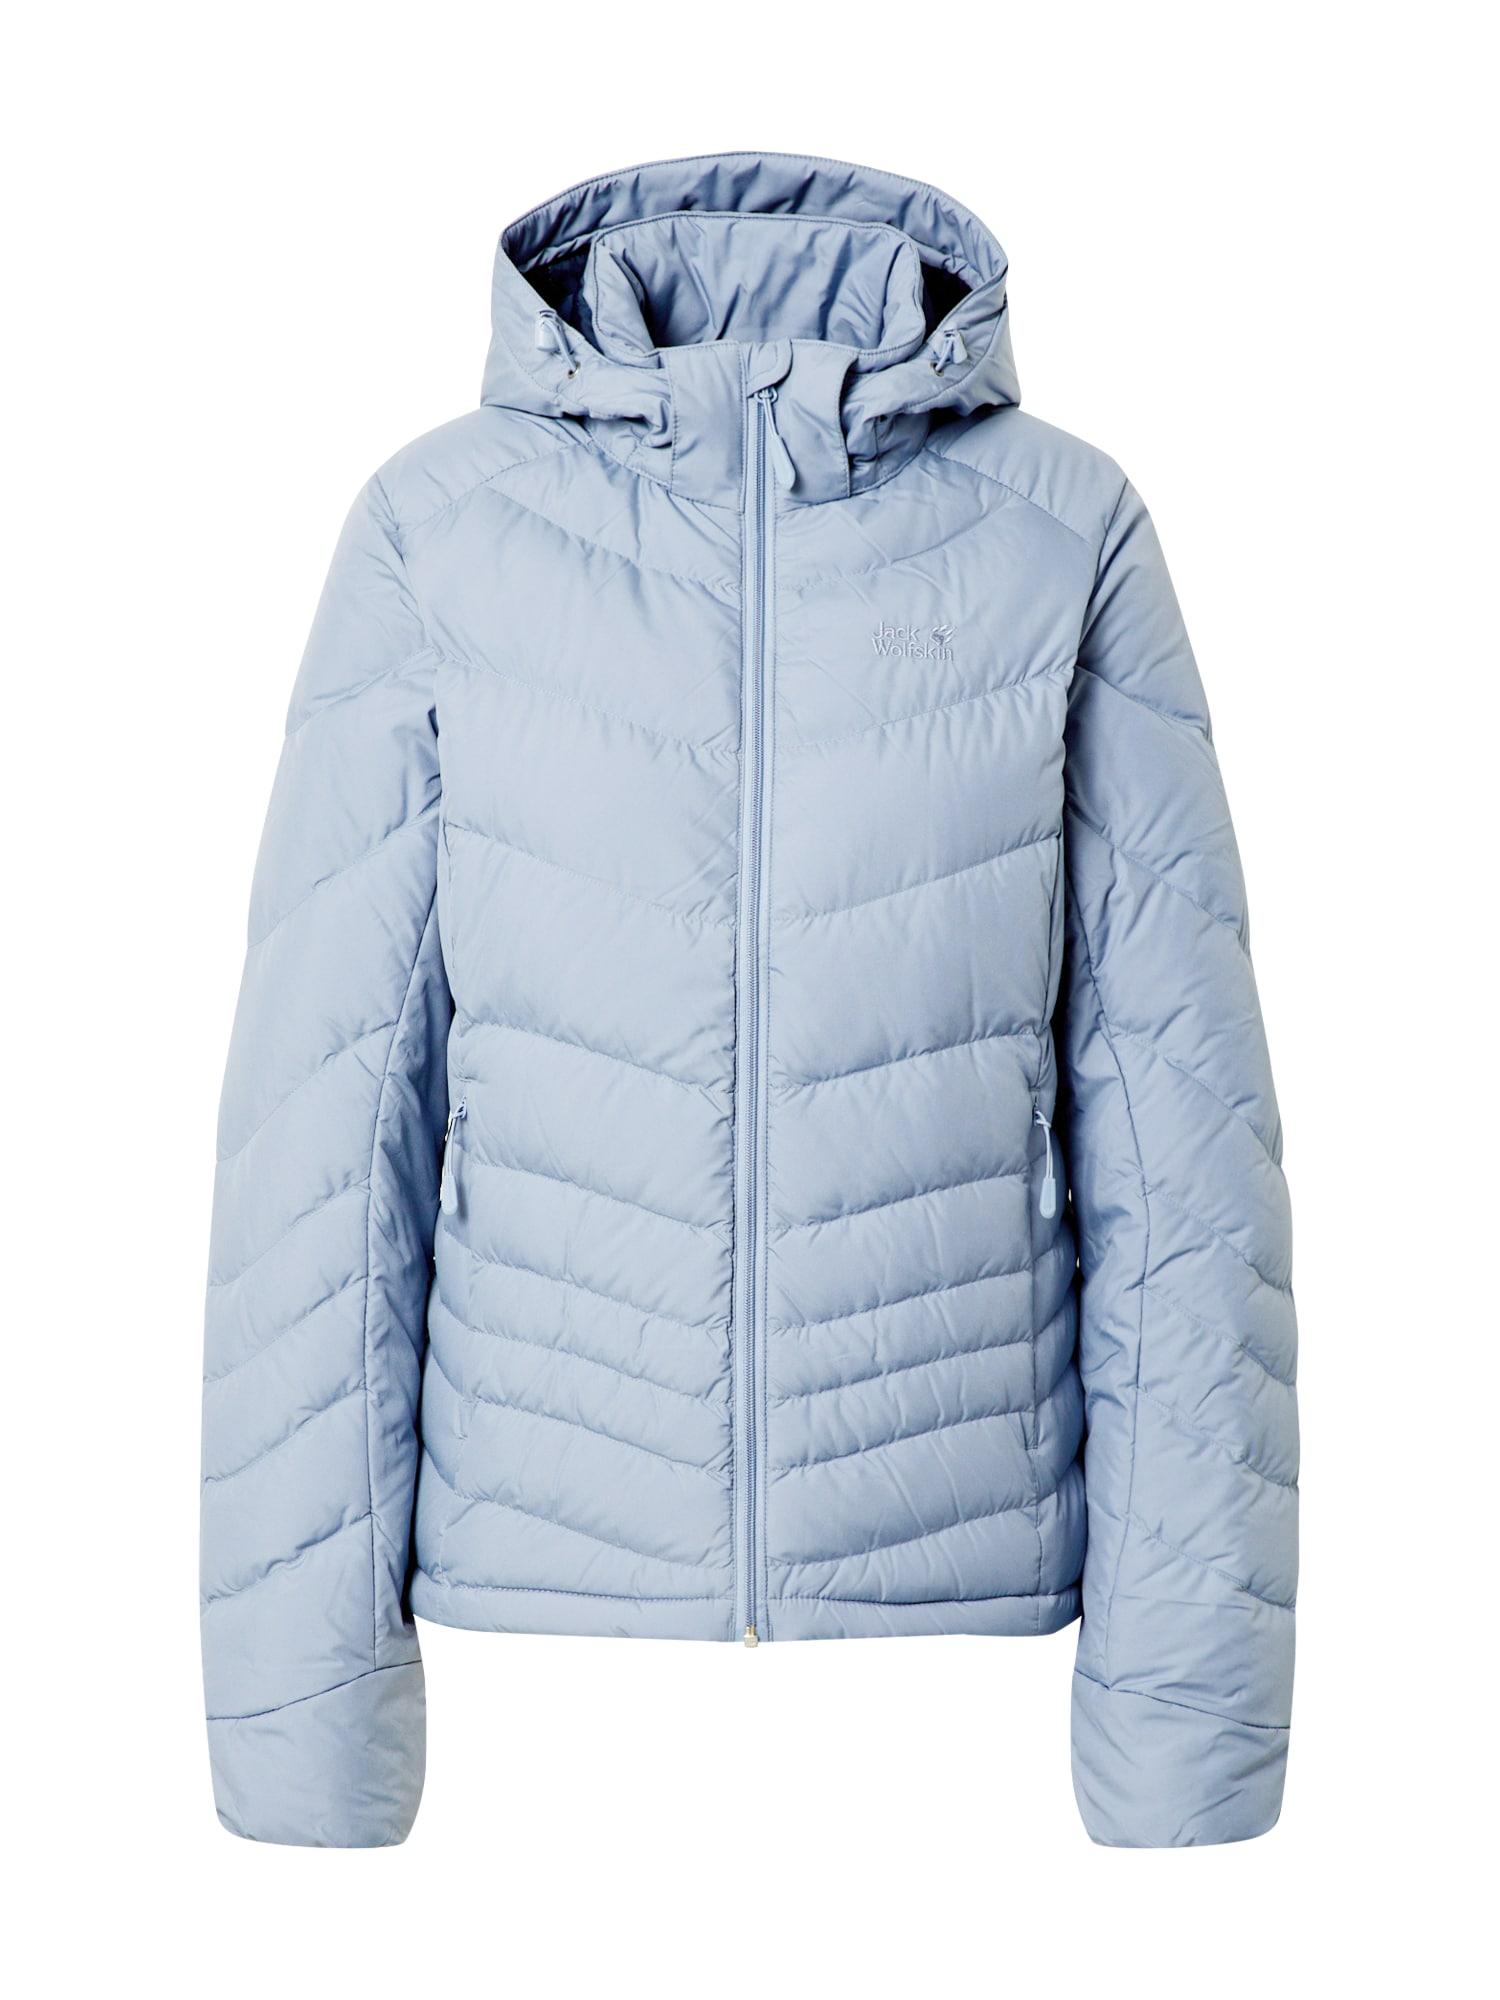 JACK WOLFSKIN Outdoorová bunda 'Selenium'  modrá